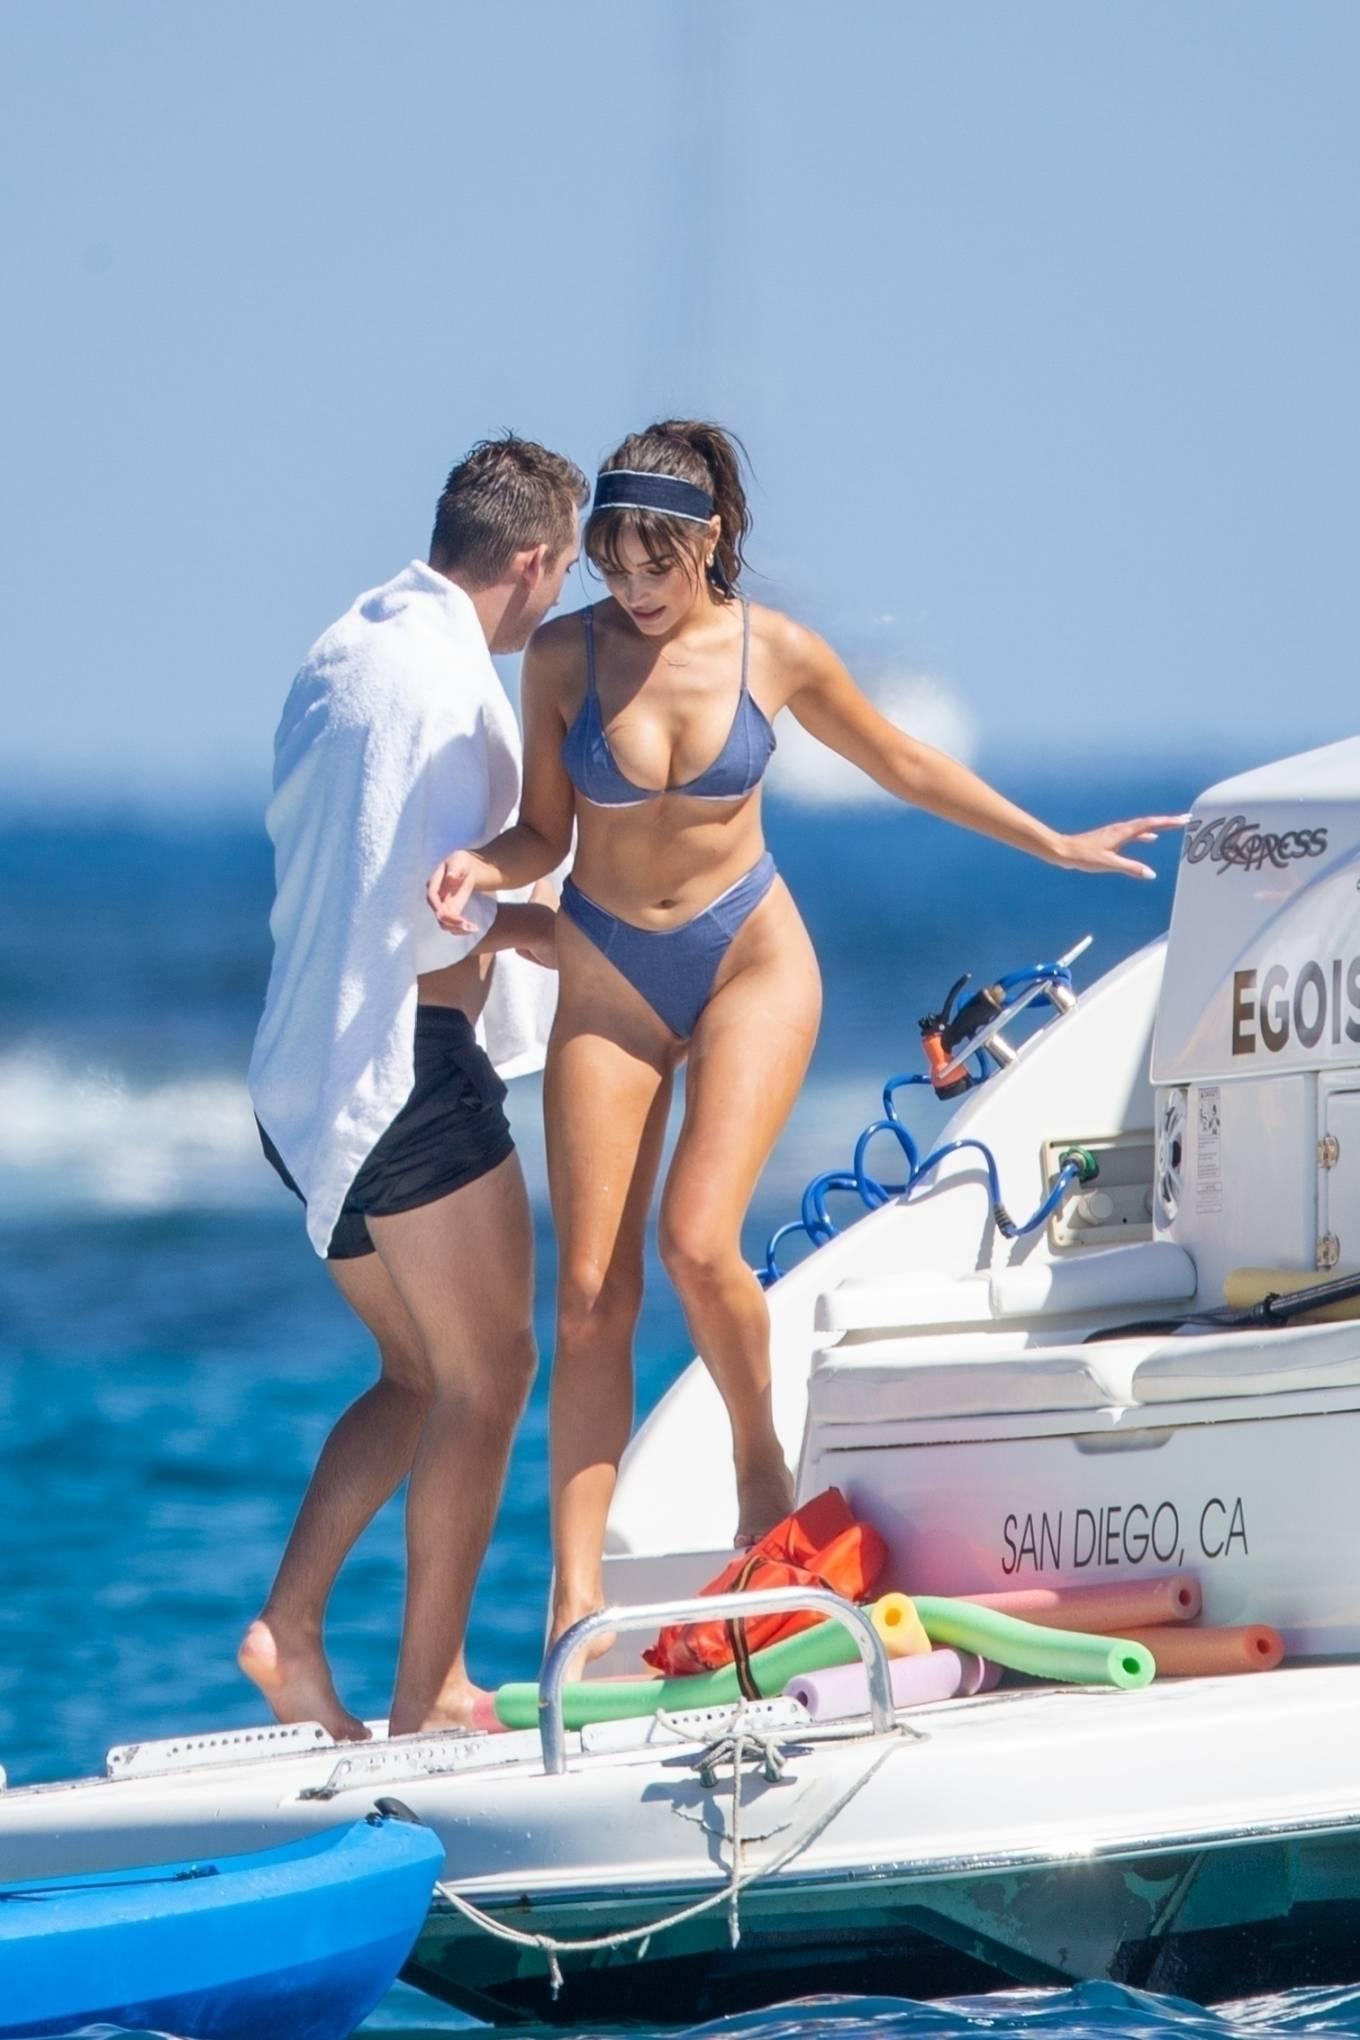 Olivia Culpo wearing a very low neck blue bikini top with spaghetti straps